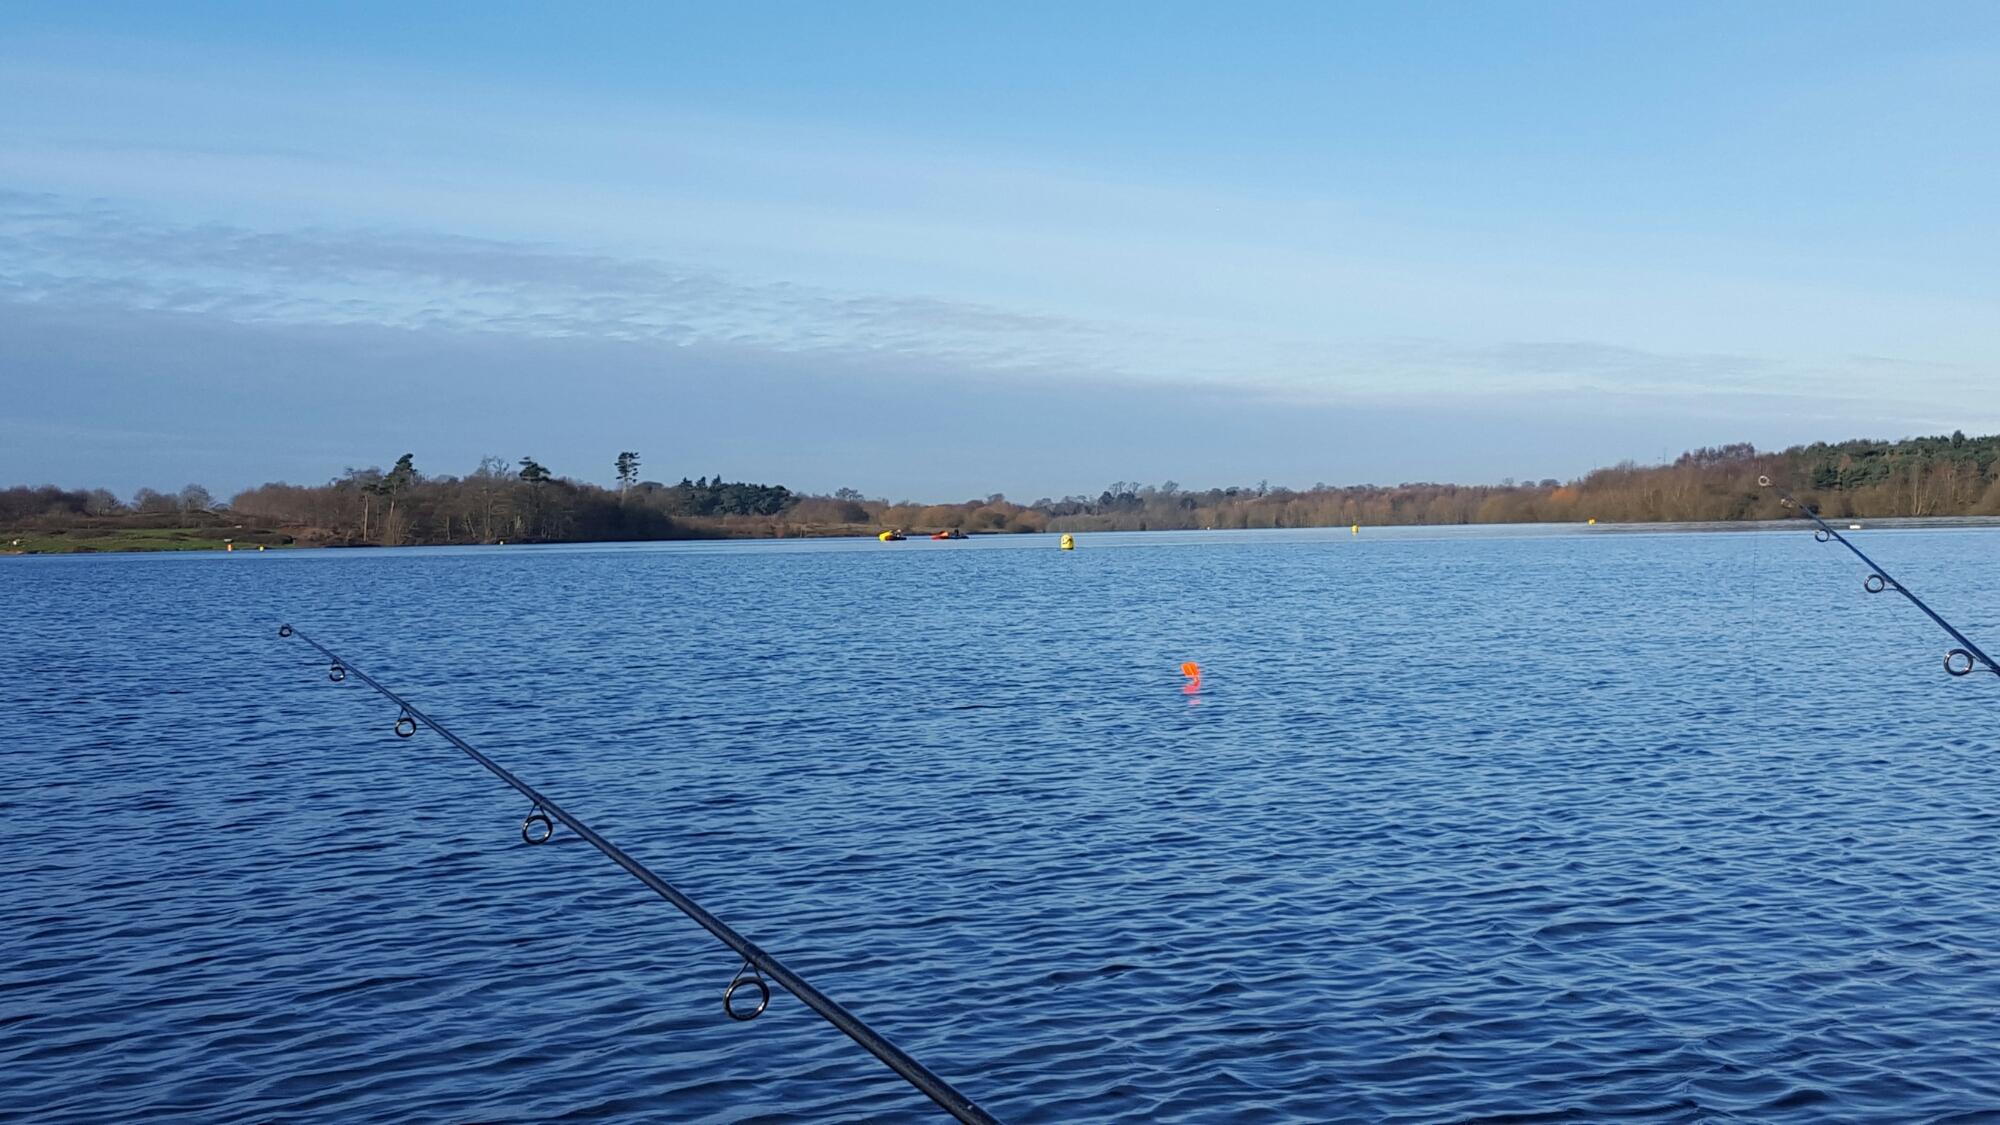 Trip 8 9 pike fishing 2016 uk carp coarse fishing for Fishing videos 2016